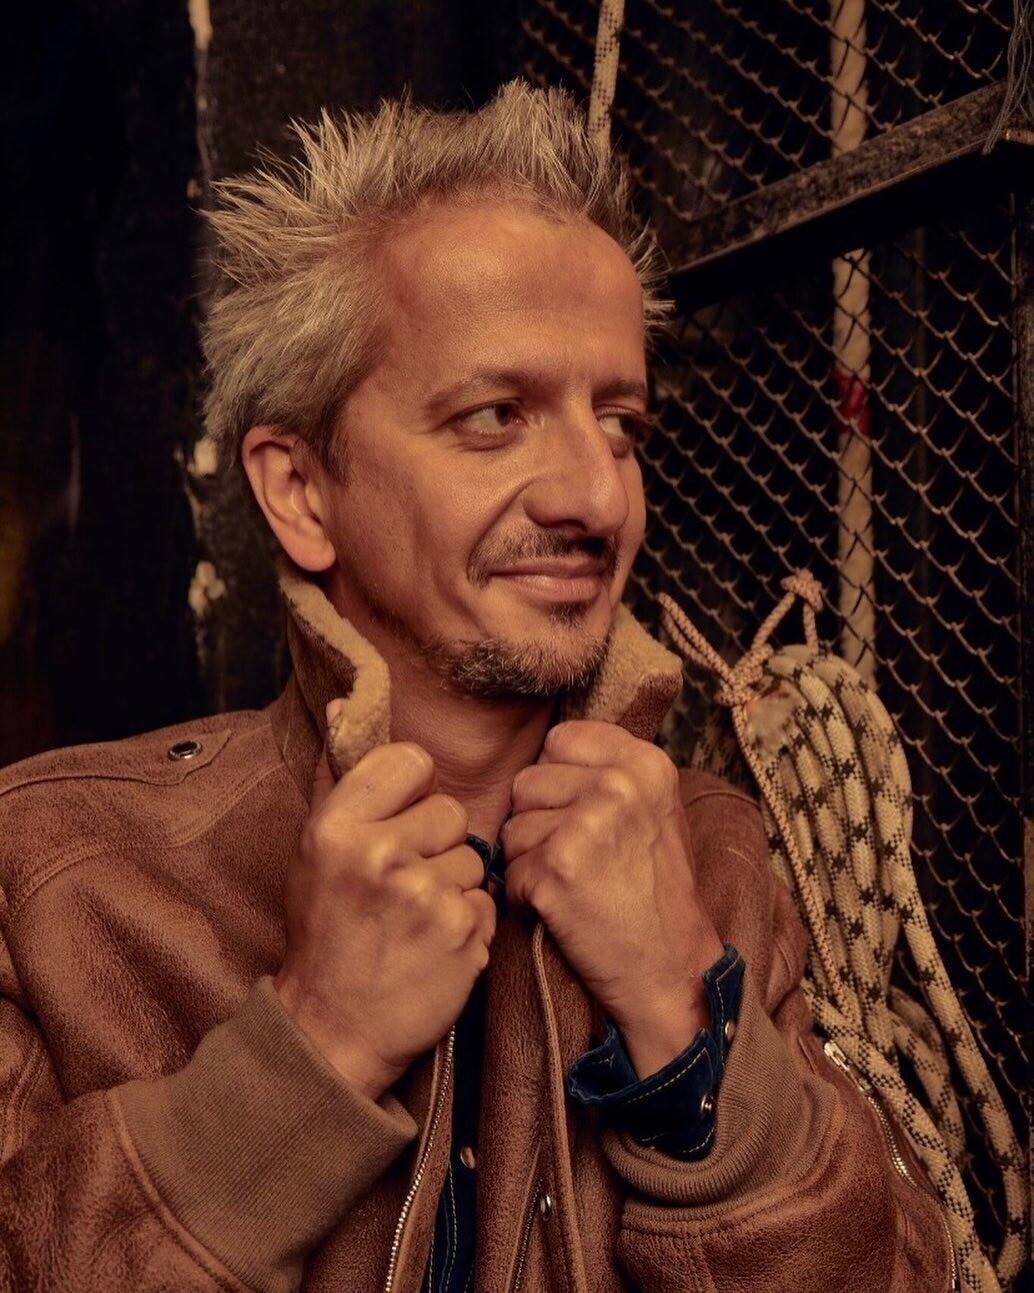 Константин Богомолов показал первое видео со съемок сериала про «ангарского маньяка»